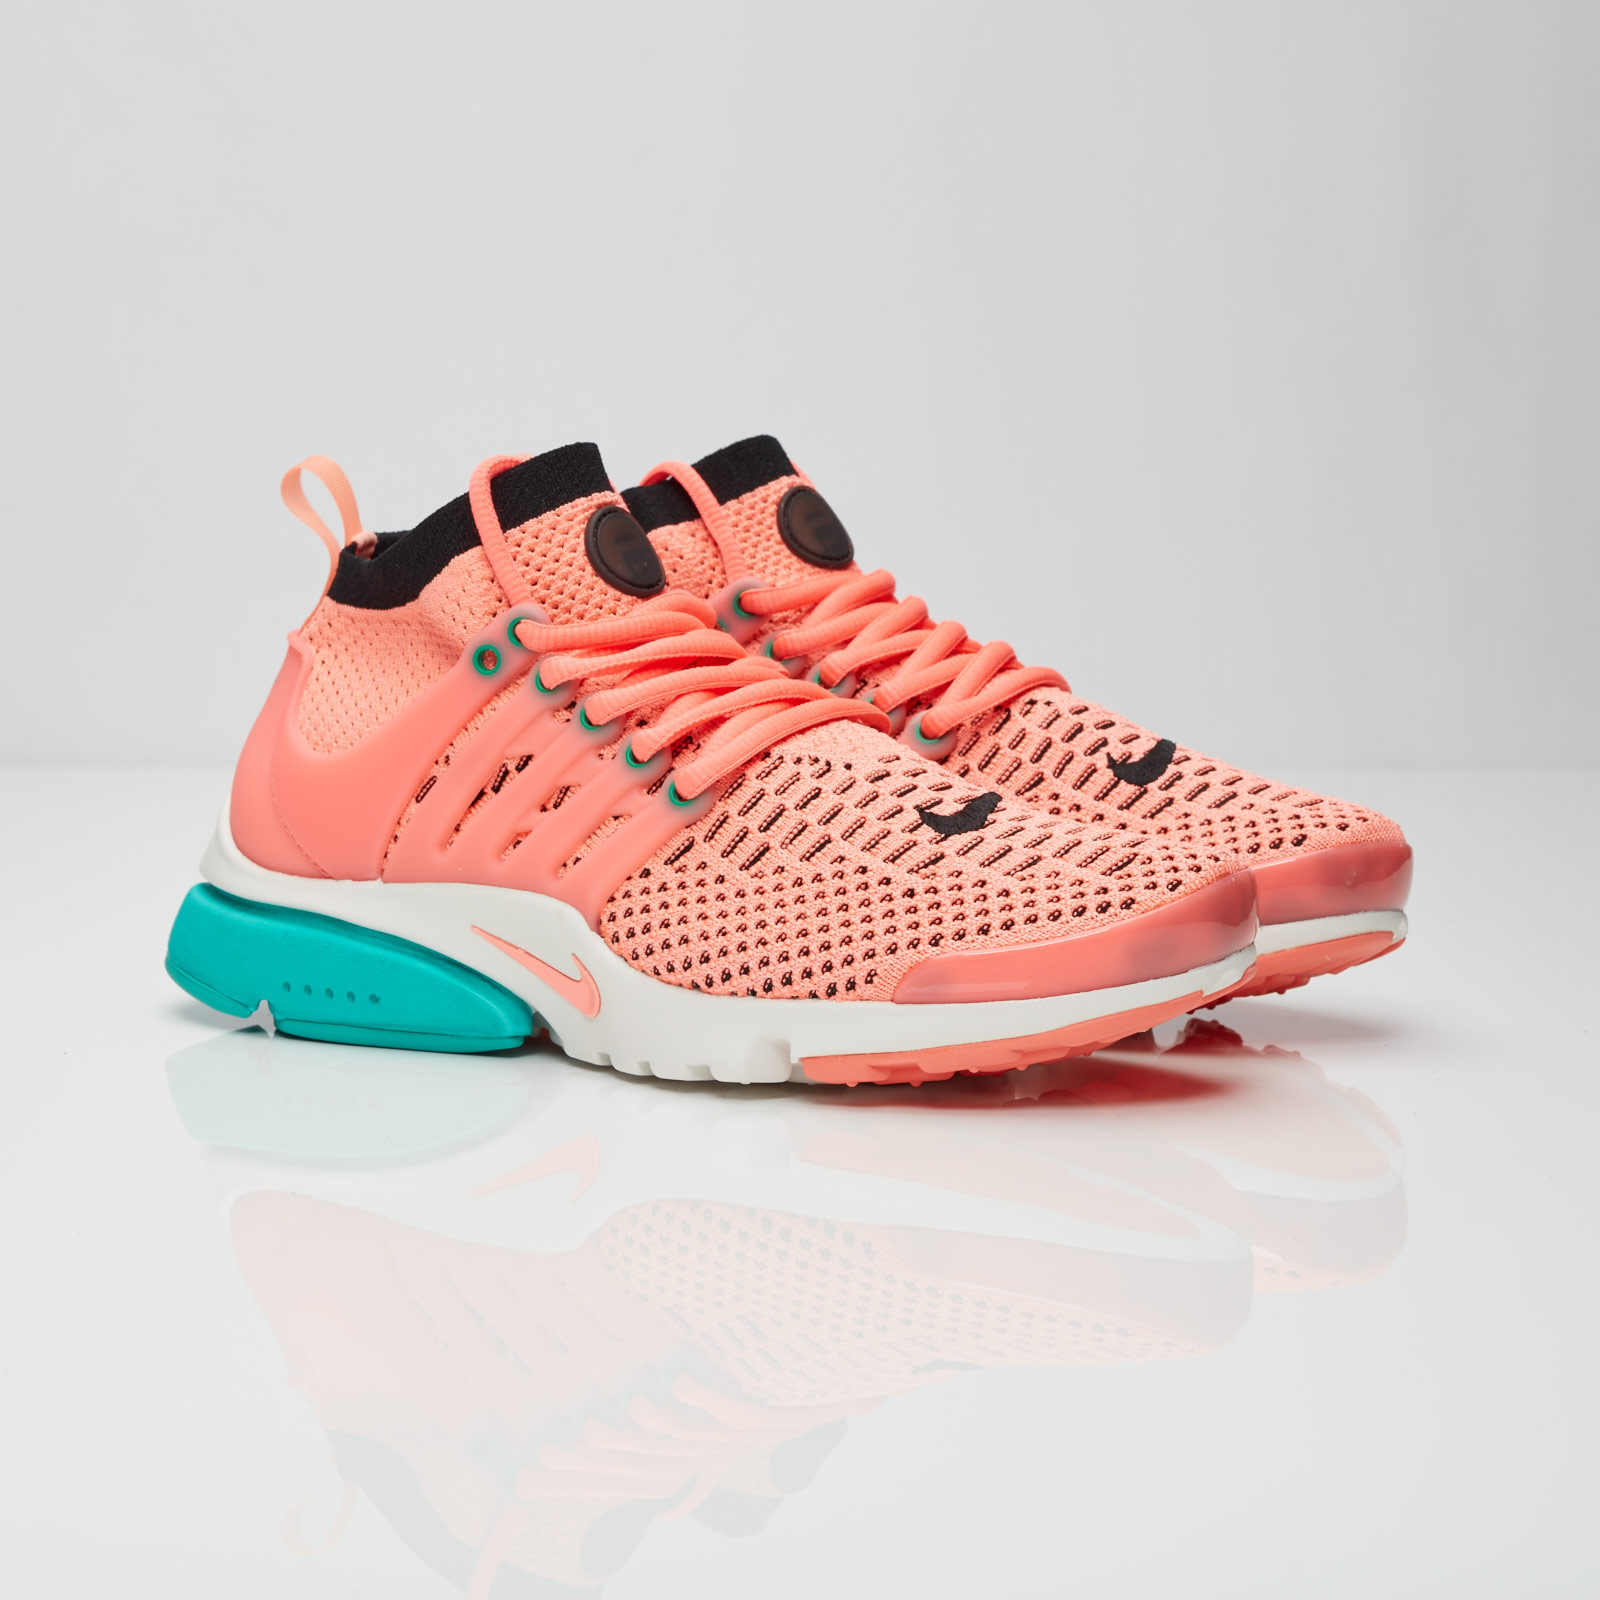 f7065aee3a79 Nike Wmns Air Presto Flyknit Ultra - 835738-600 - Sneakersnstuff ...